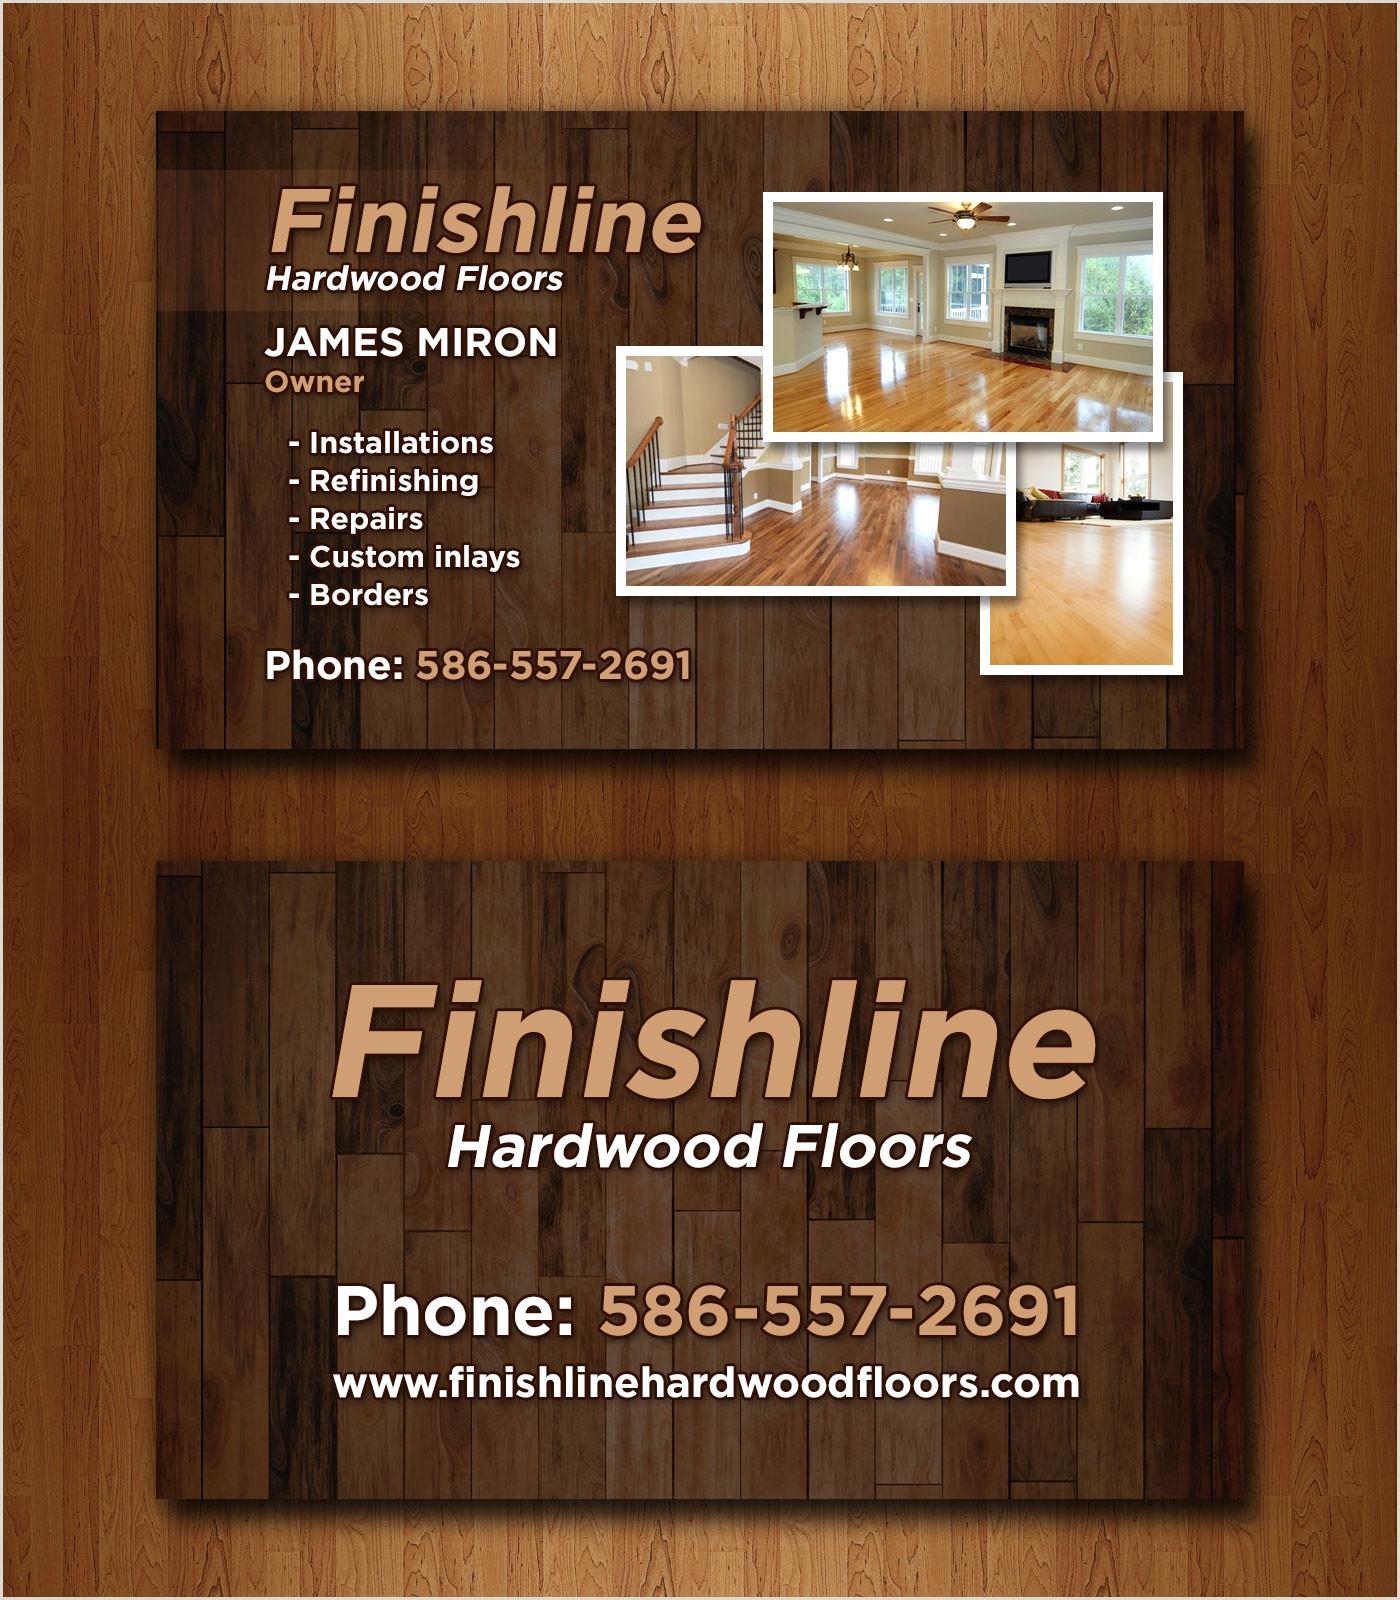 Web Design Business Cards Templates 14 Popular Hardwood Flooring Business Card Template